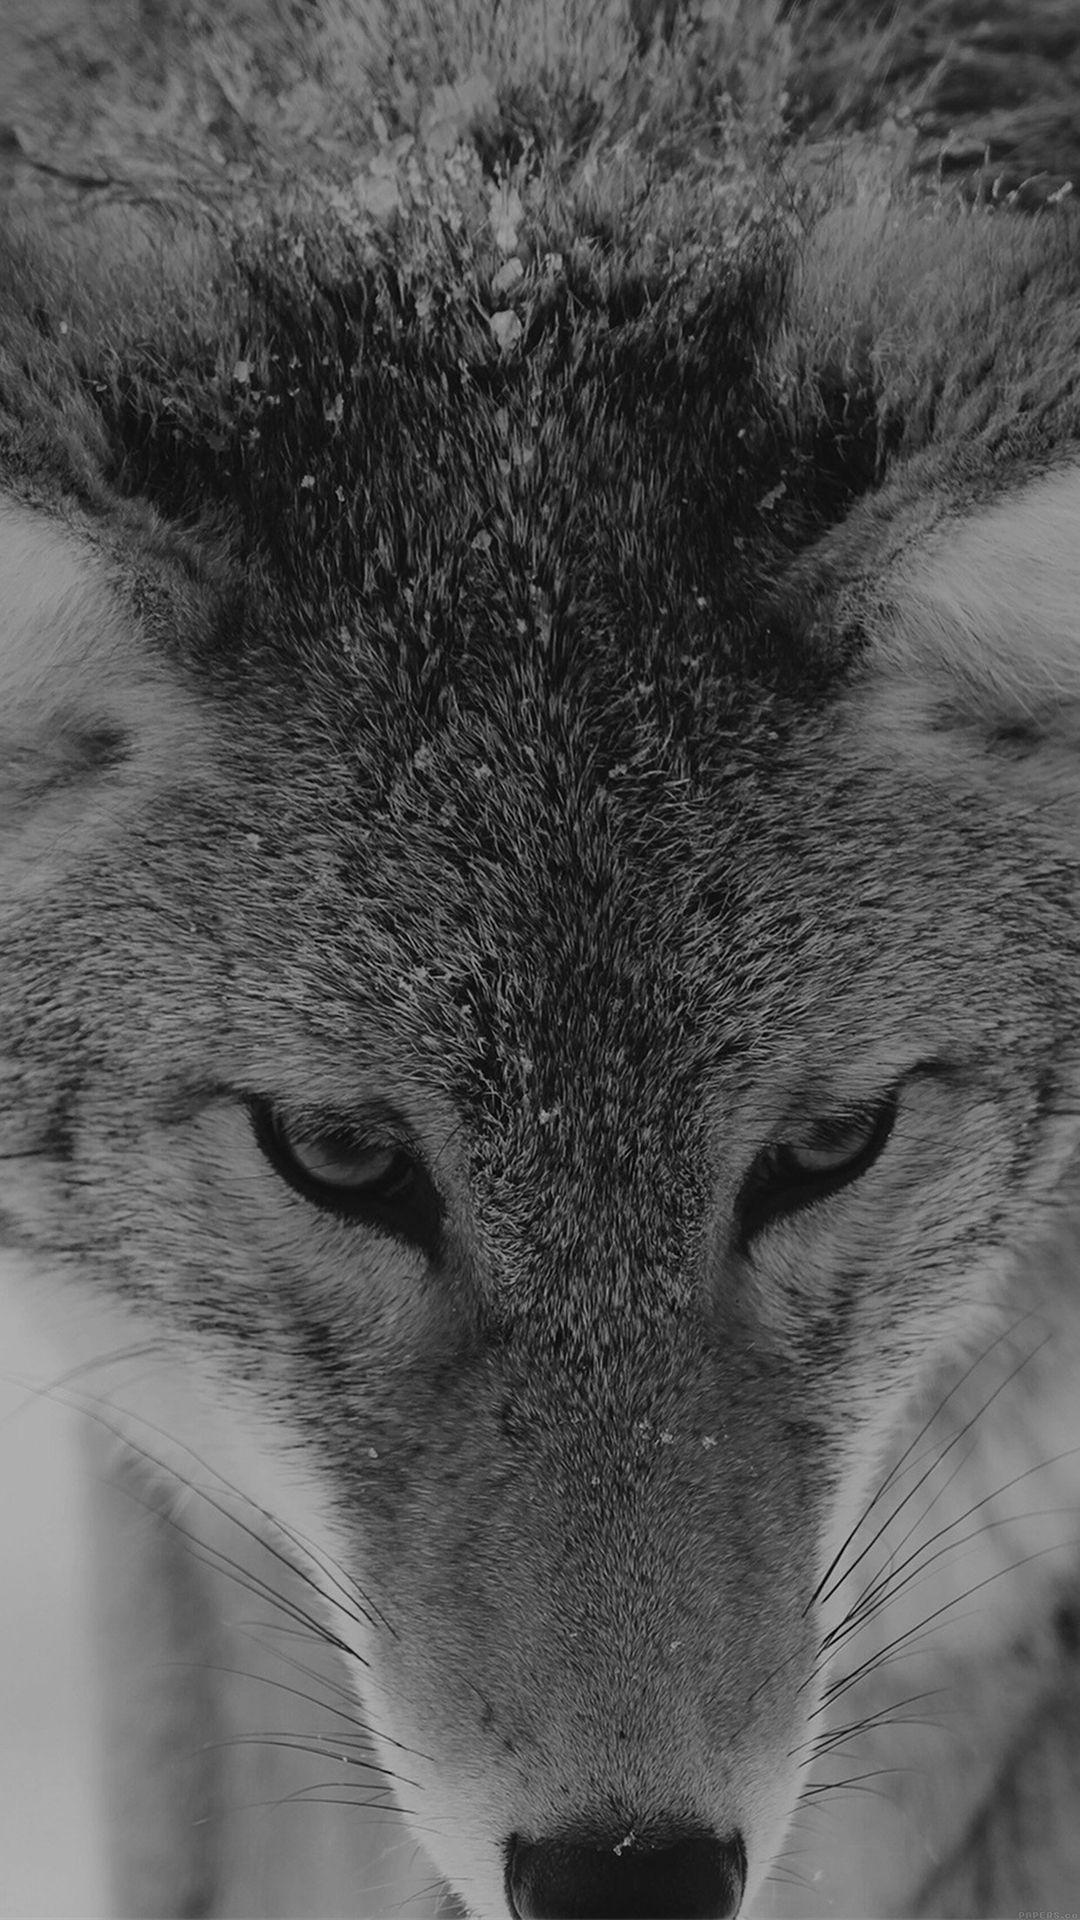 Animal iphone wallpaper tumblr - Snow Wolf Animal Macro Iphone 6 Wallpaper